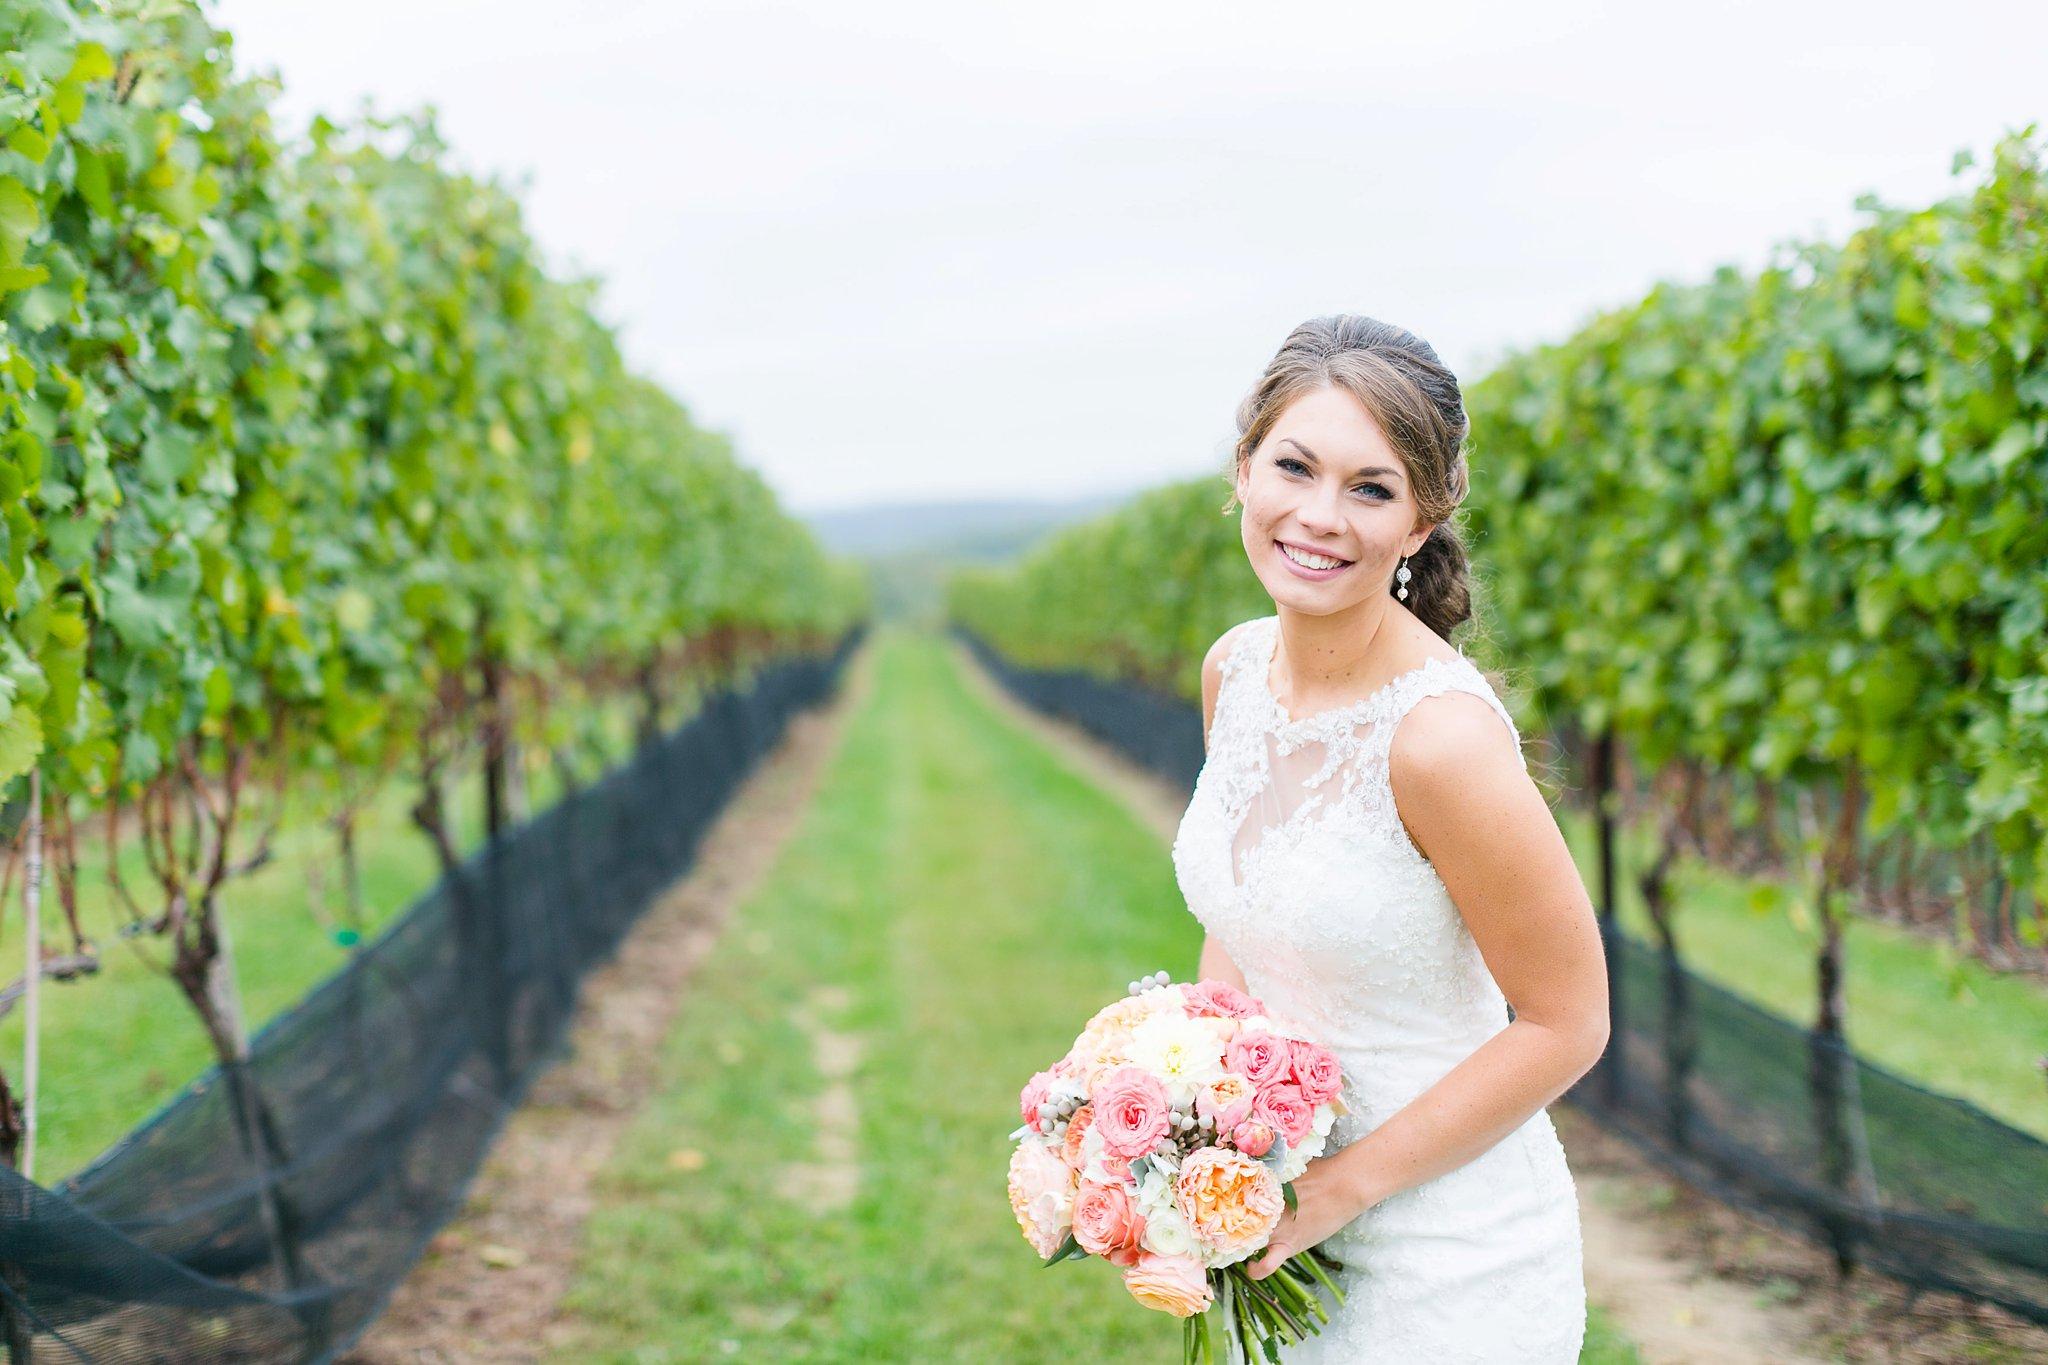 Stone Tower Winery Wedding Photos Virginia Wedding Photographer Megan Kelsey Photography Sam & Angela-201.jpg